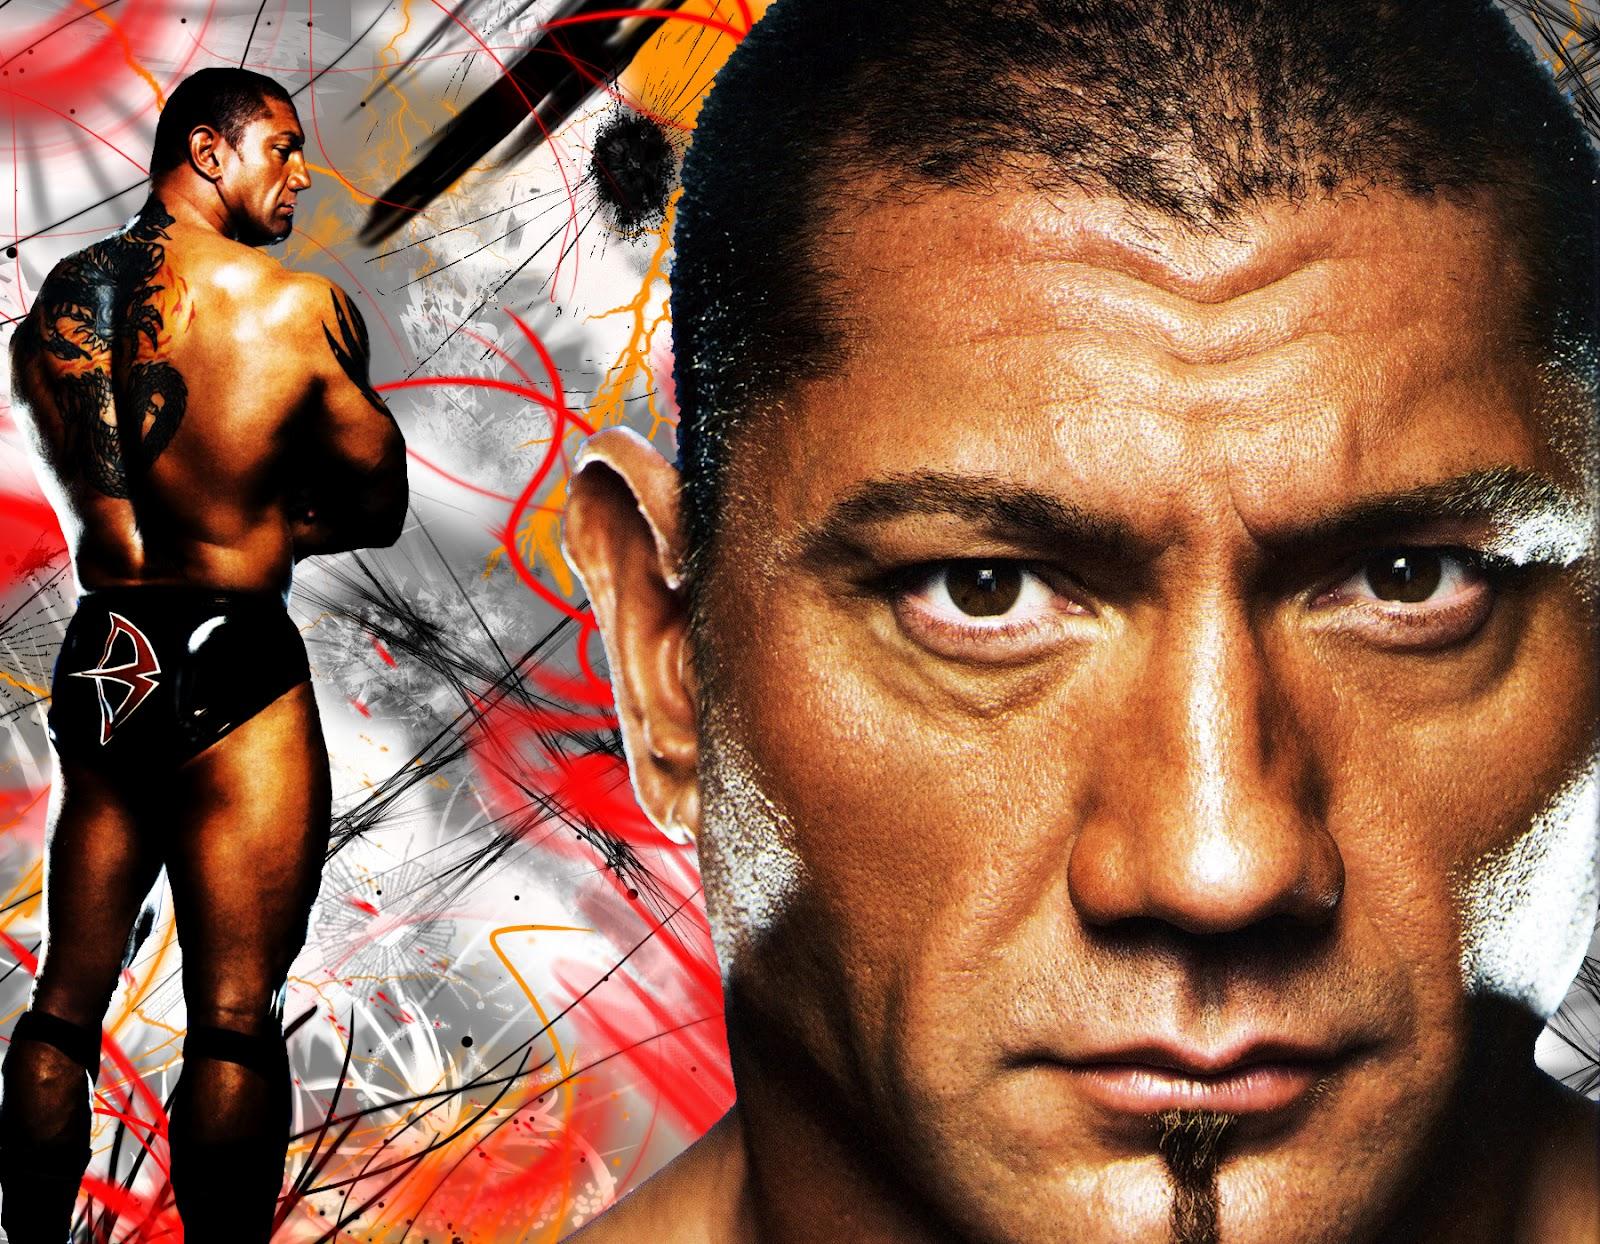 http://1.bp.blogspot.com/-cCZ0uGmLB7c/T9zIrNmGltI/AAAAAAAAAY4/vfmGkYDPz4Q/s1600/WWE_Batista_Wallpaper_by_Marco8ynwa.jpg